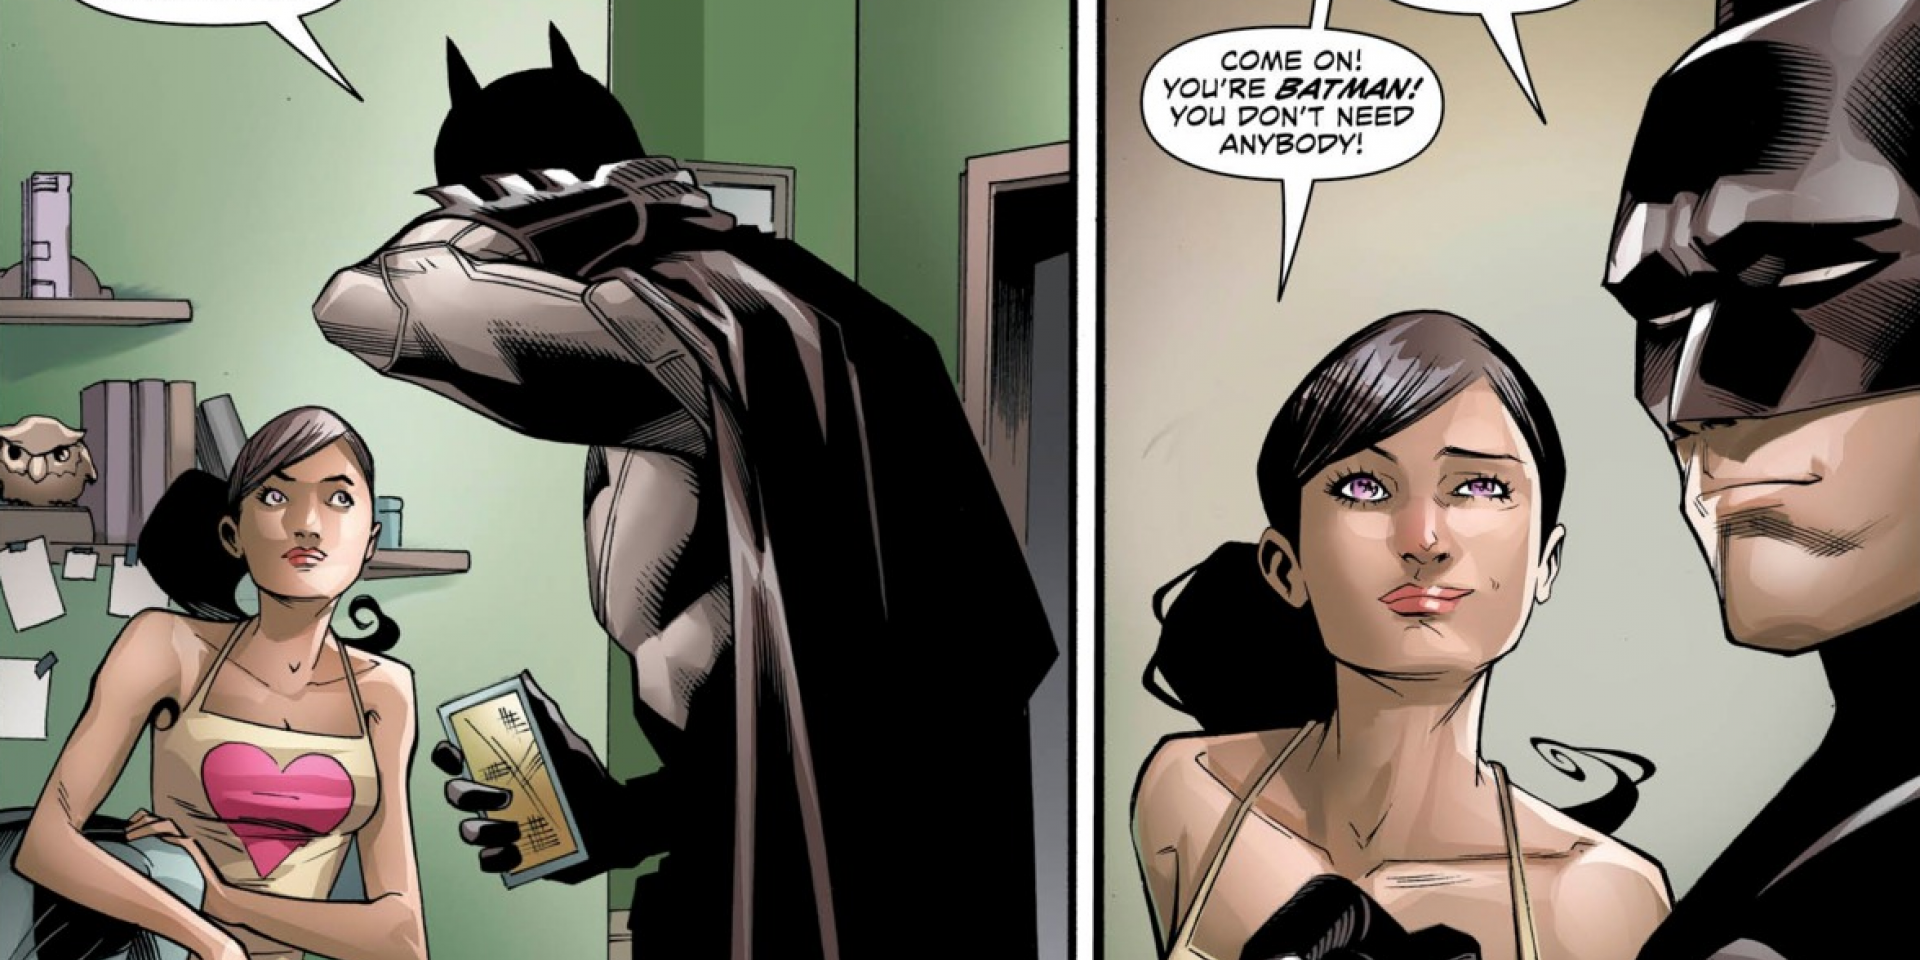 Batgirl and batman dating profile 9